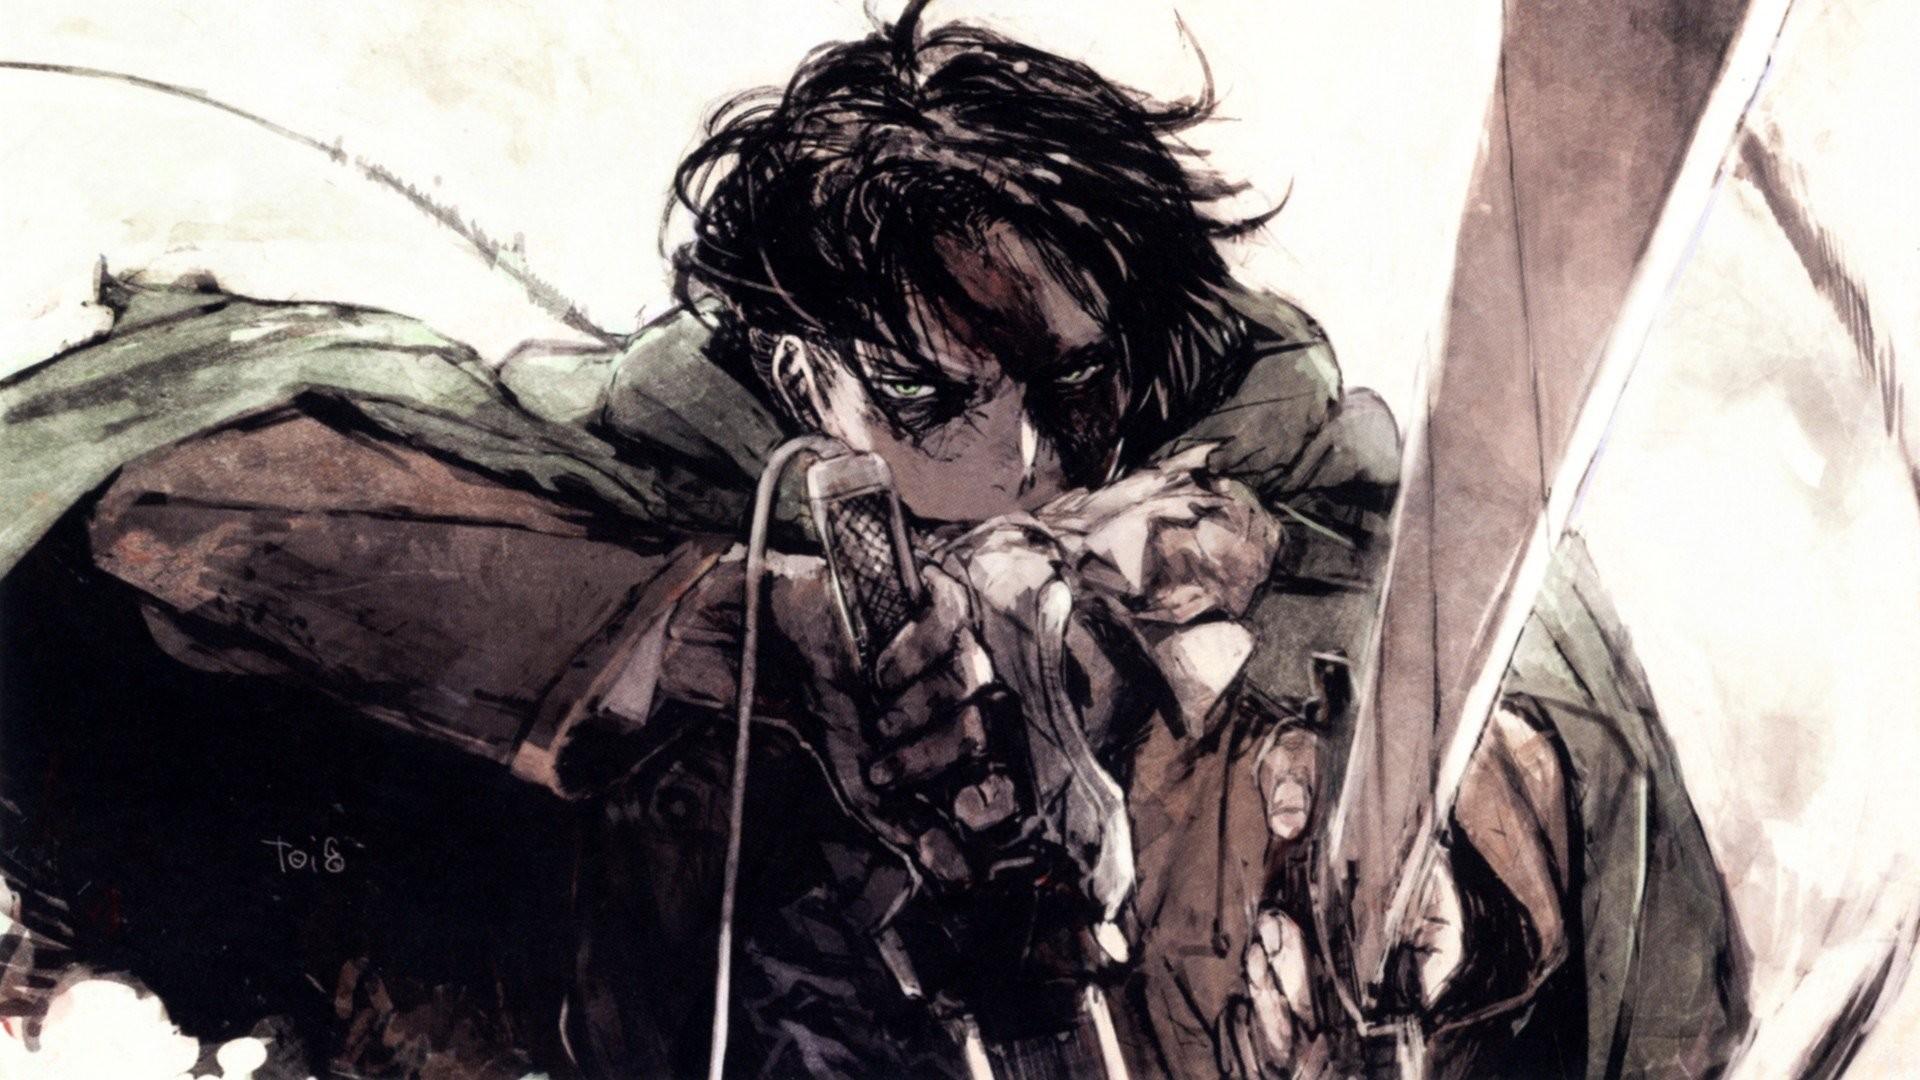 Shingeki no Kyojin Series Levi Ackerman Character wallpaper      717810   WallpaperUP